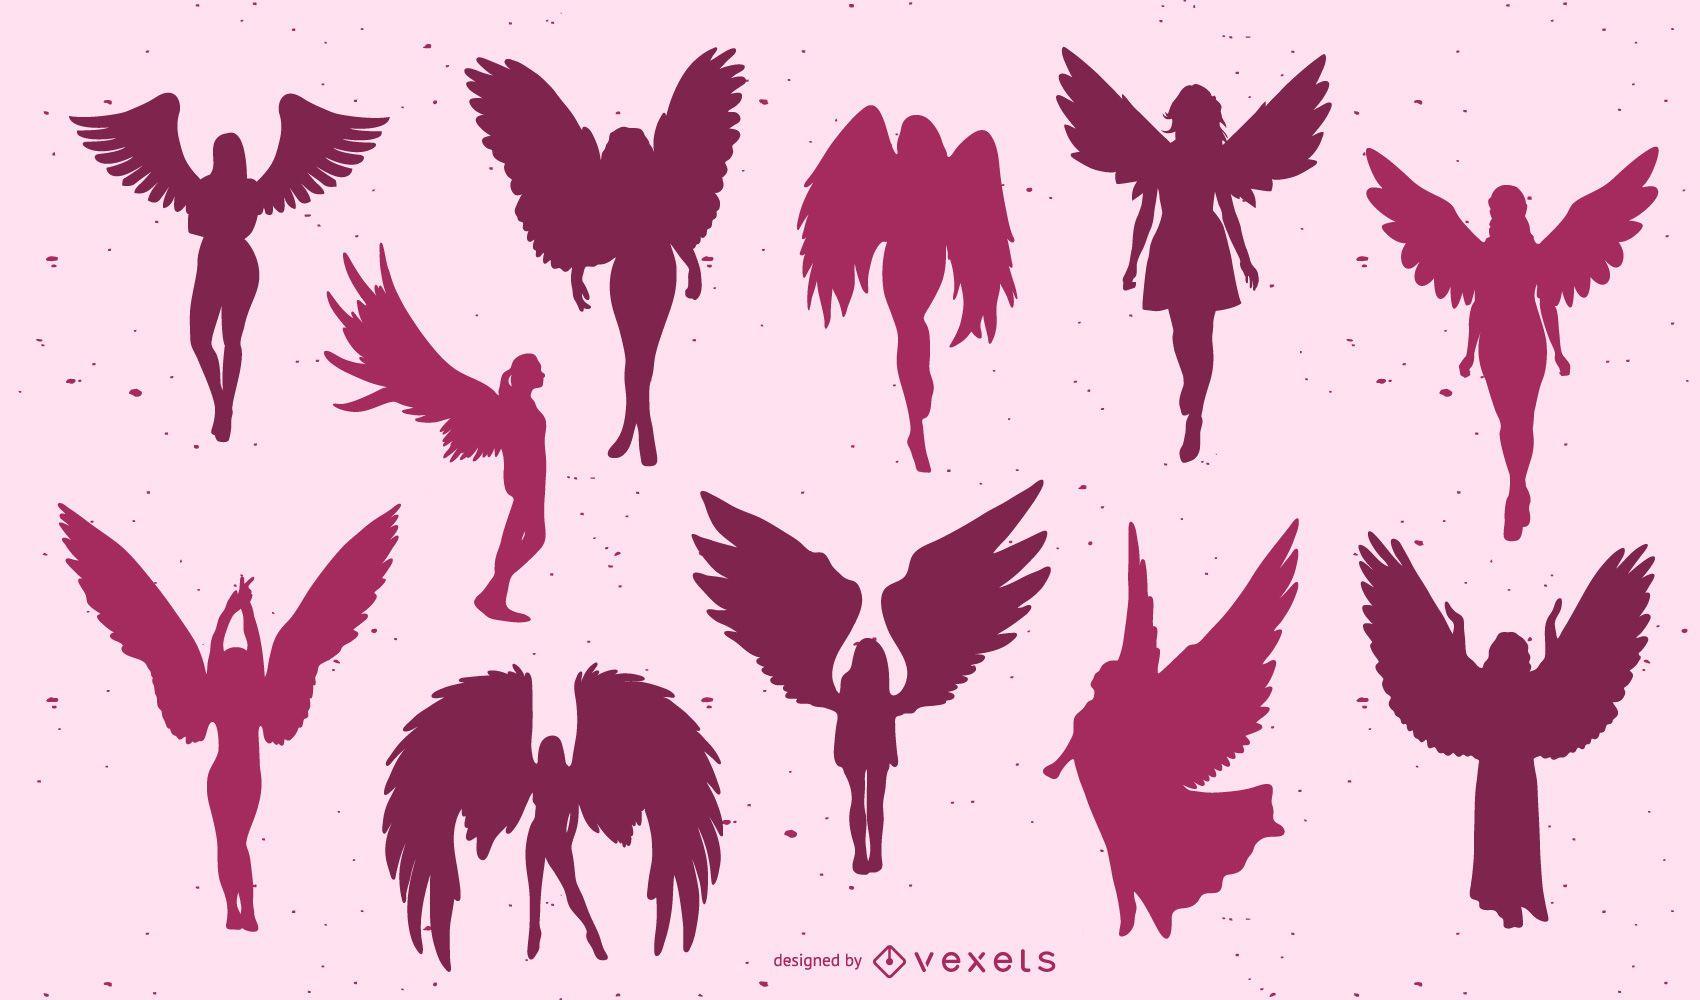 Beautiful angels silhouette set